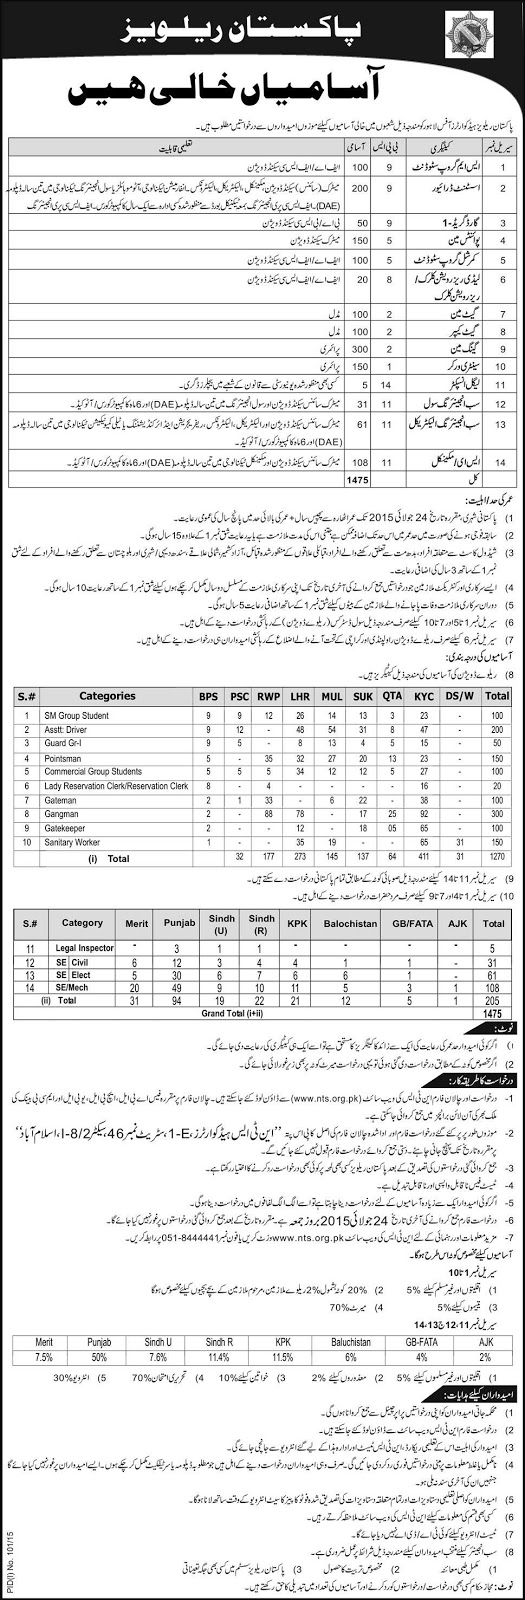 Pakistan Railways Jobs through NTS Test | Download PPSC FPSC